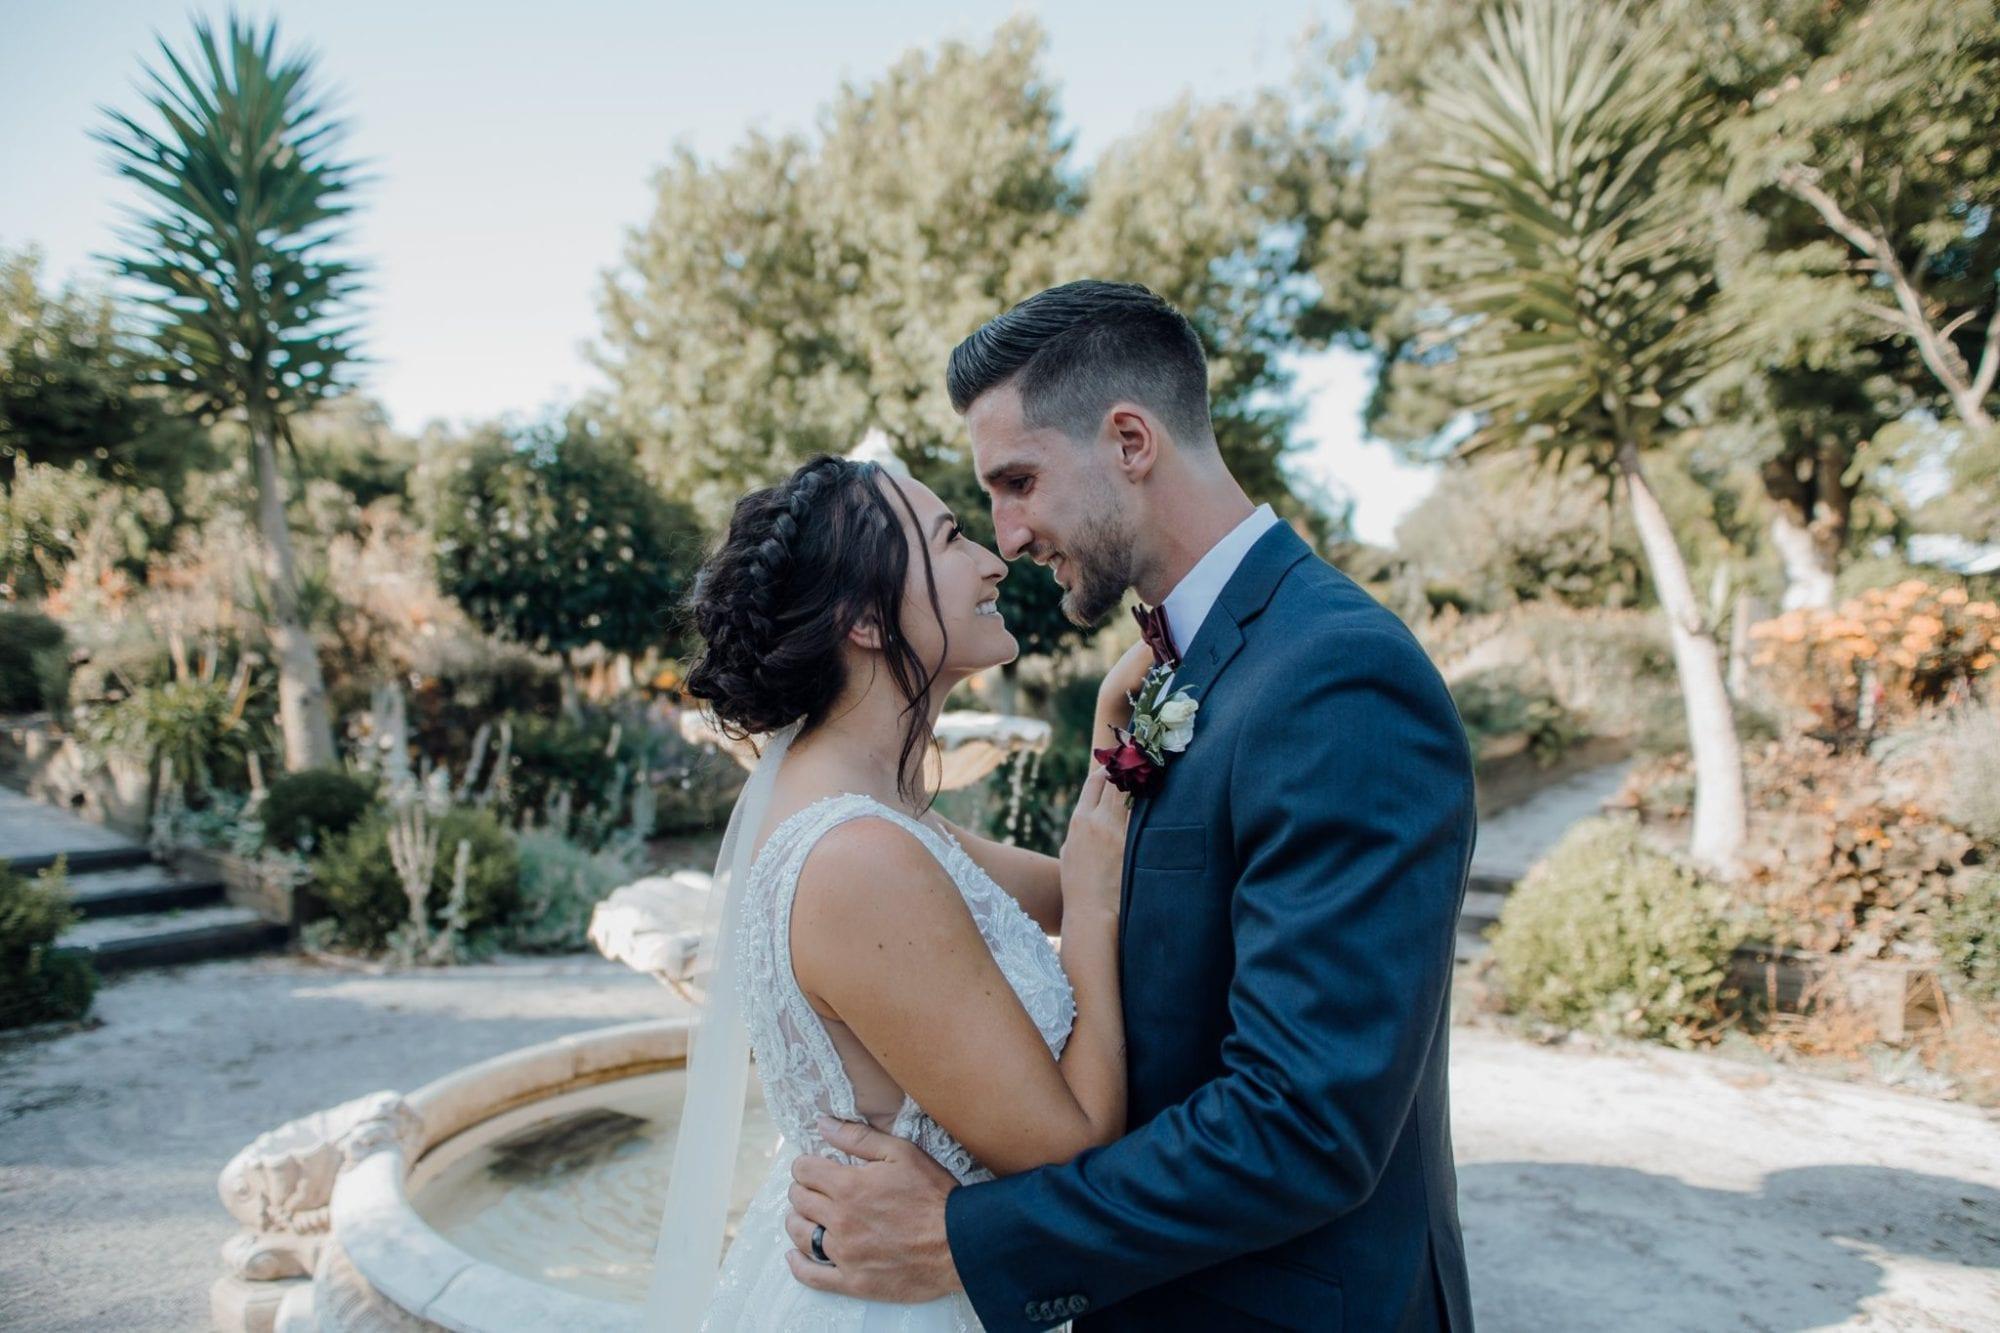 McCaw wedding: Gemma Flynns style over the years   Stuff